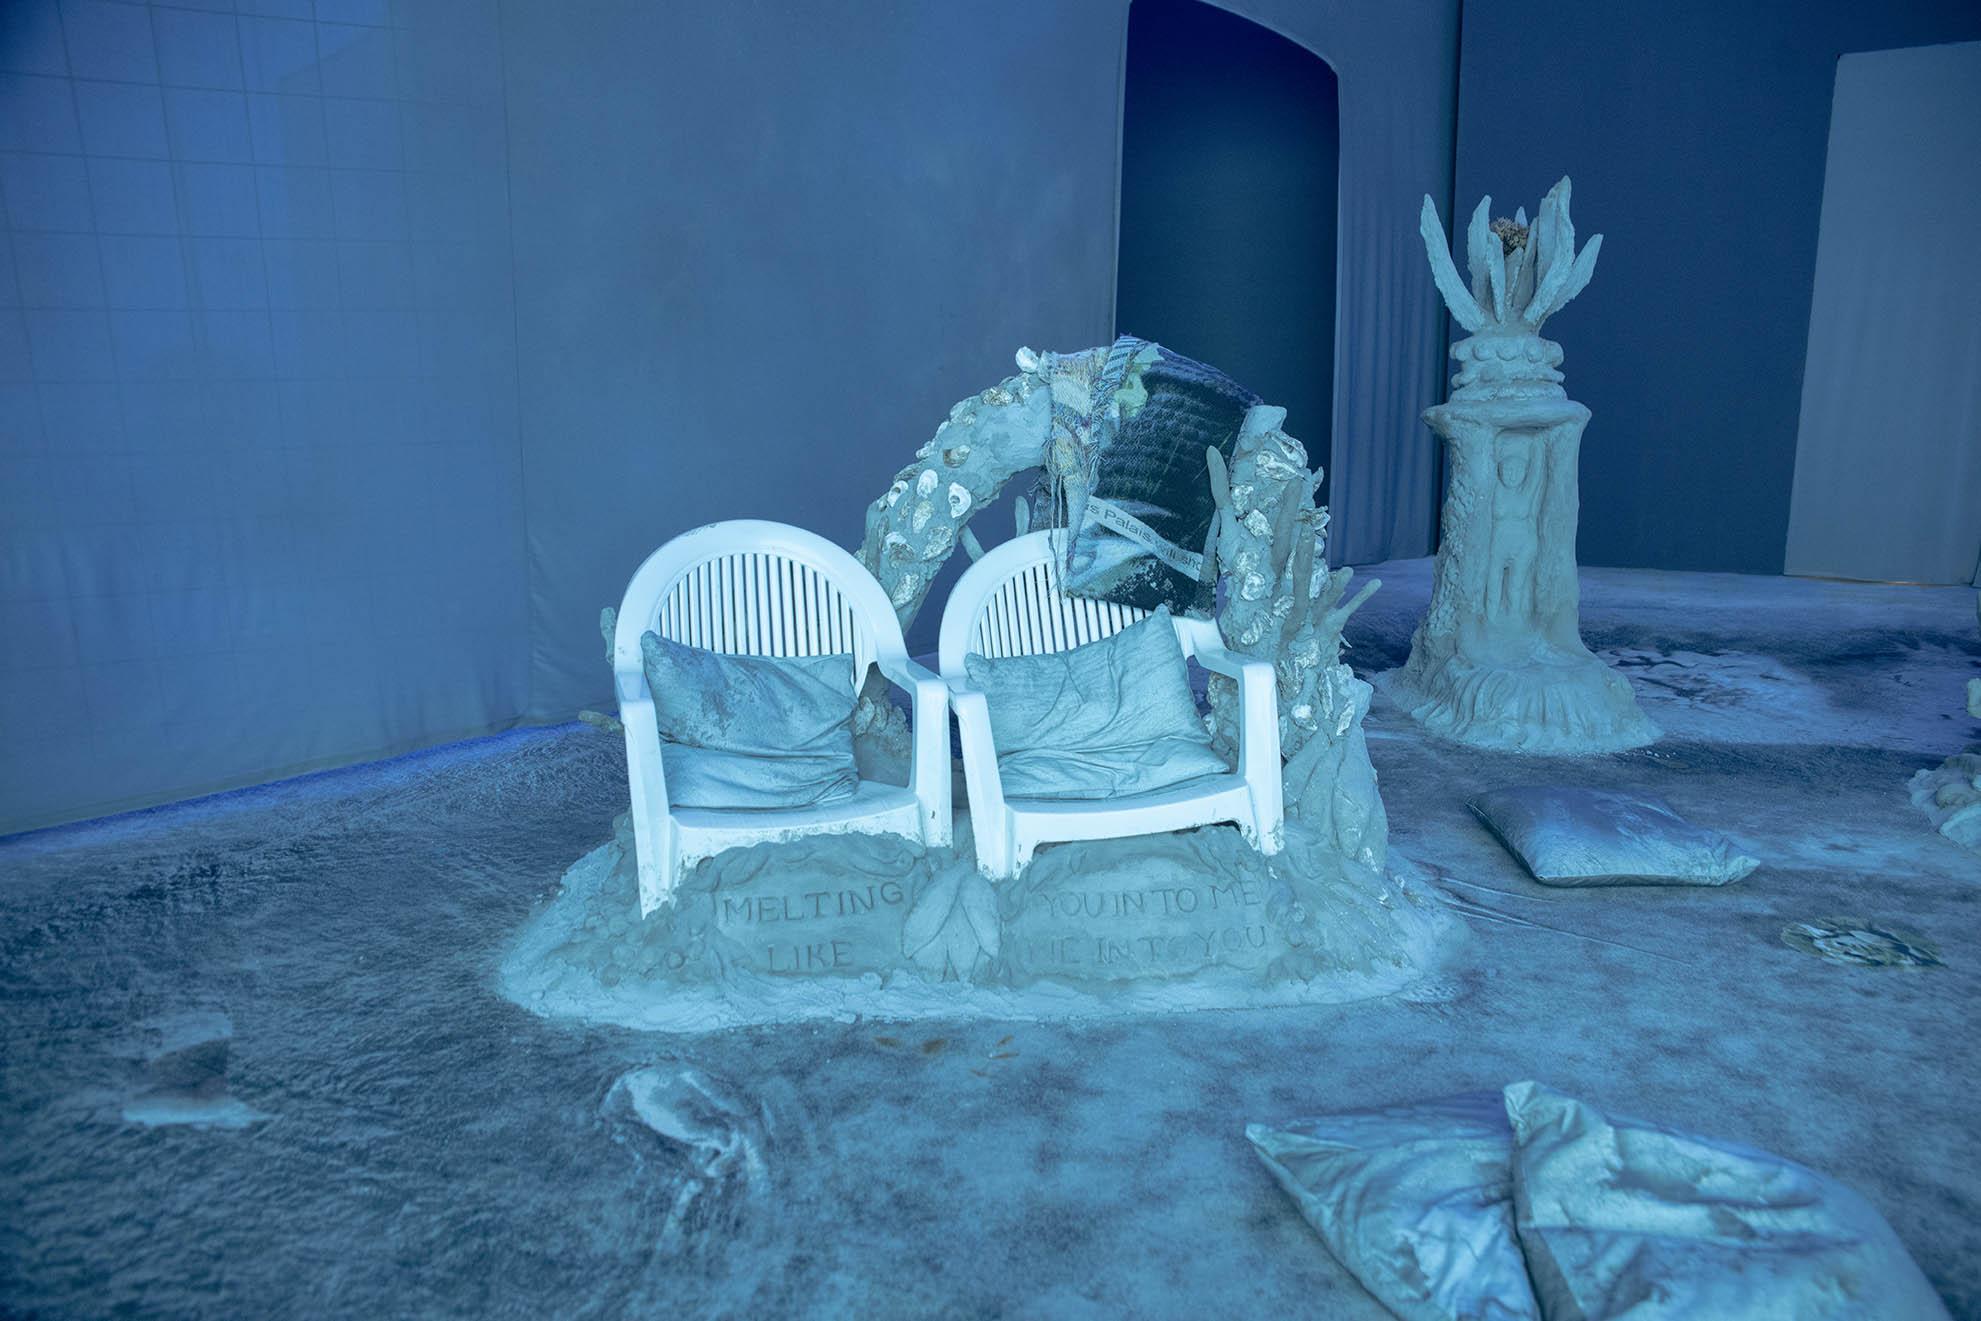 Laure Prouvost, Deep See Blue Surrounding You / Vois Ce Bleu Profond Te Fondre, French Pavilion at the 58th Venice Biennale, 2019. © Giacomo Cosua